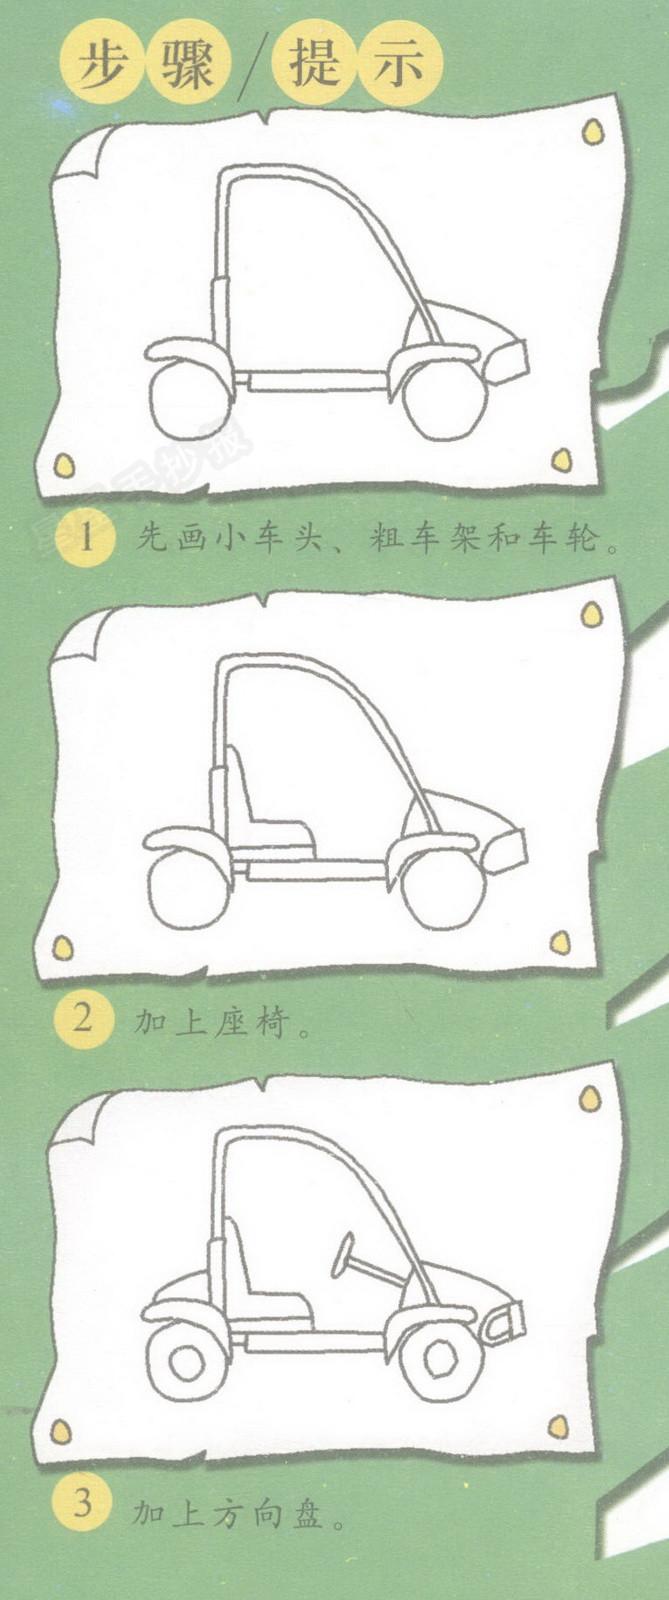 卡丁车简笔画